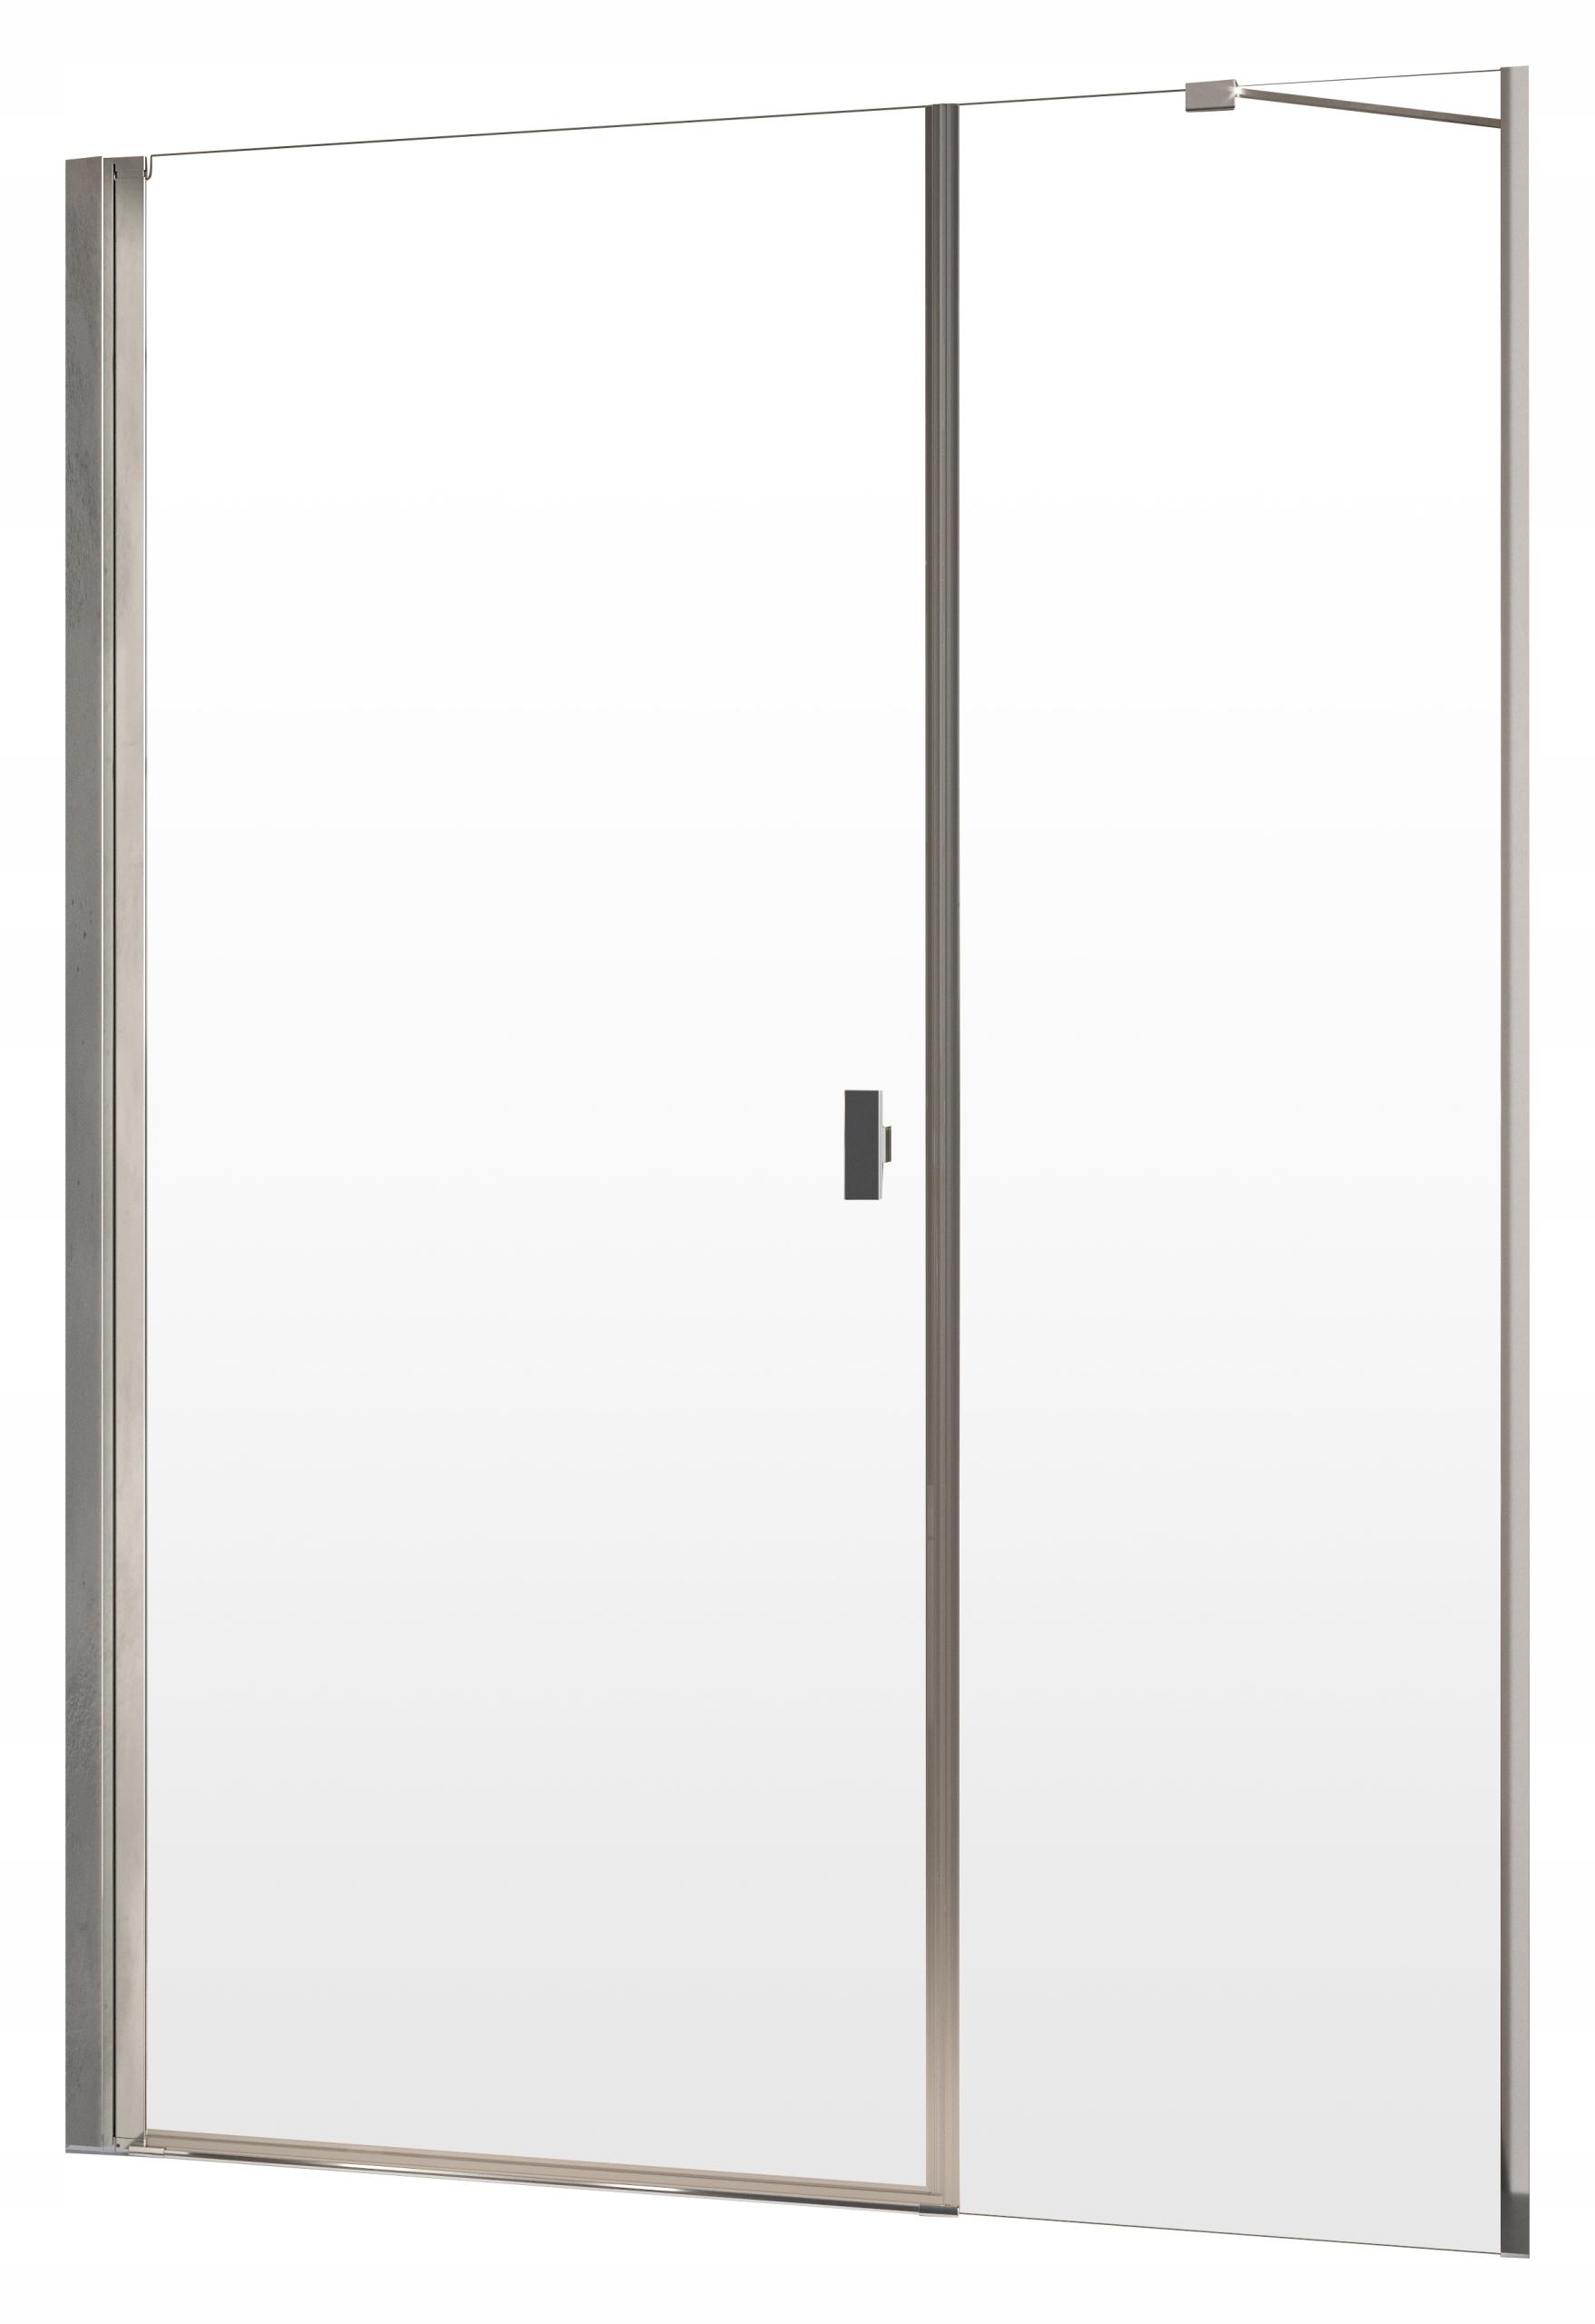 Sprchové dvere NES DWS 120x200 cm RADAWAY